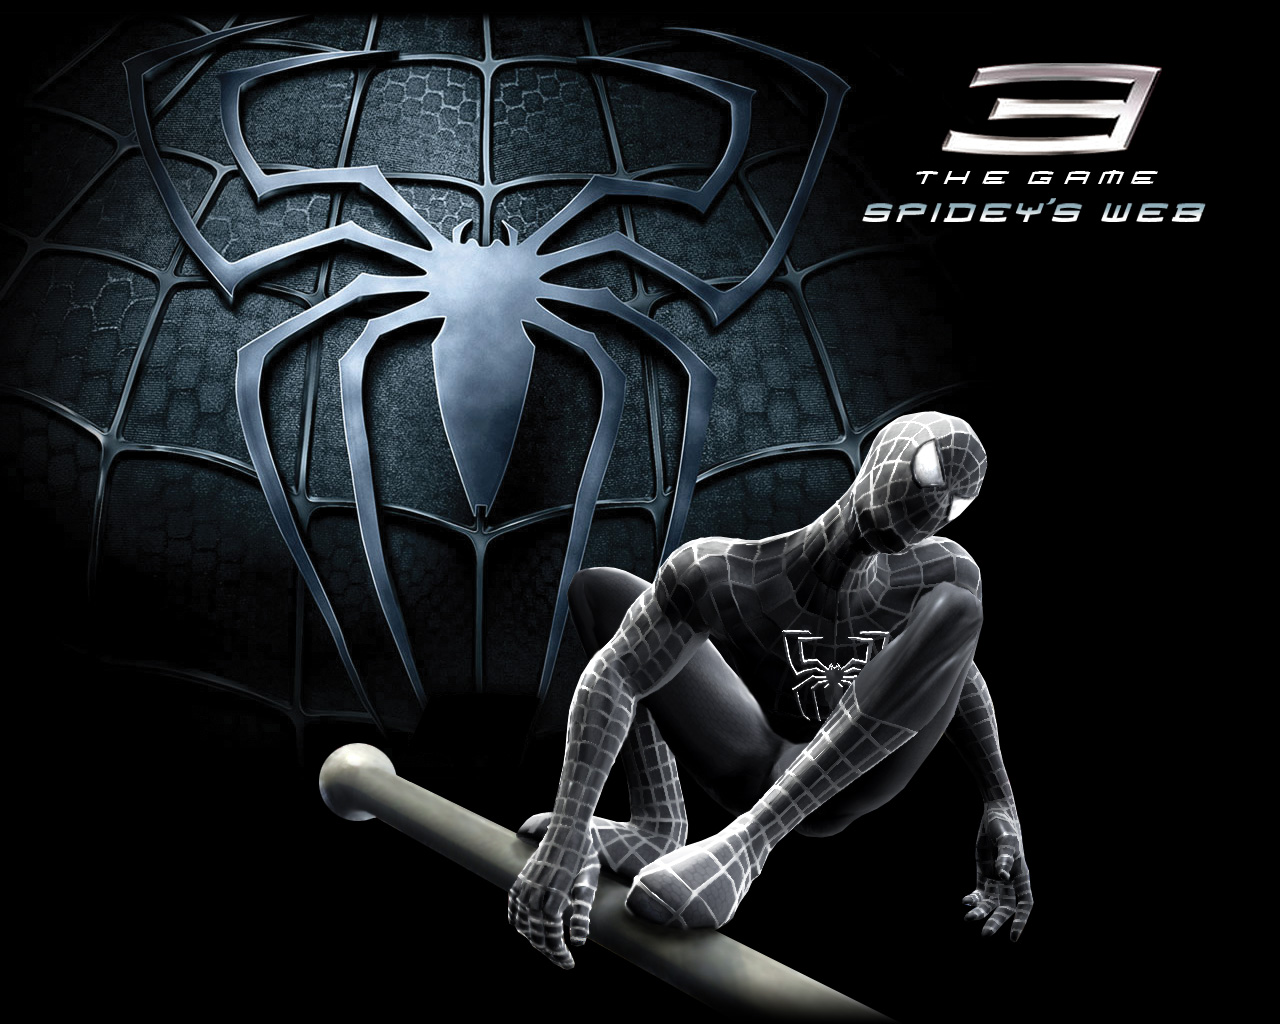 Download game spidermen 3 jar